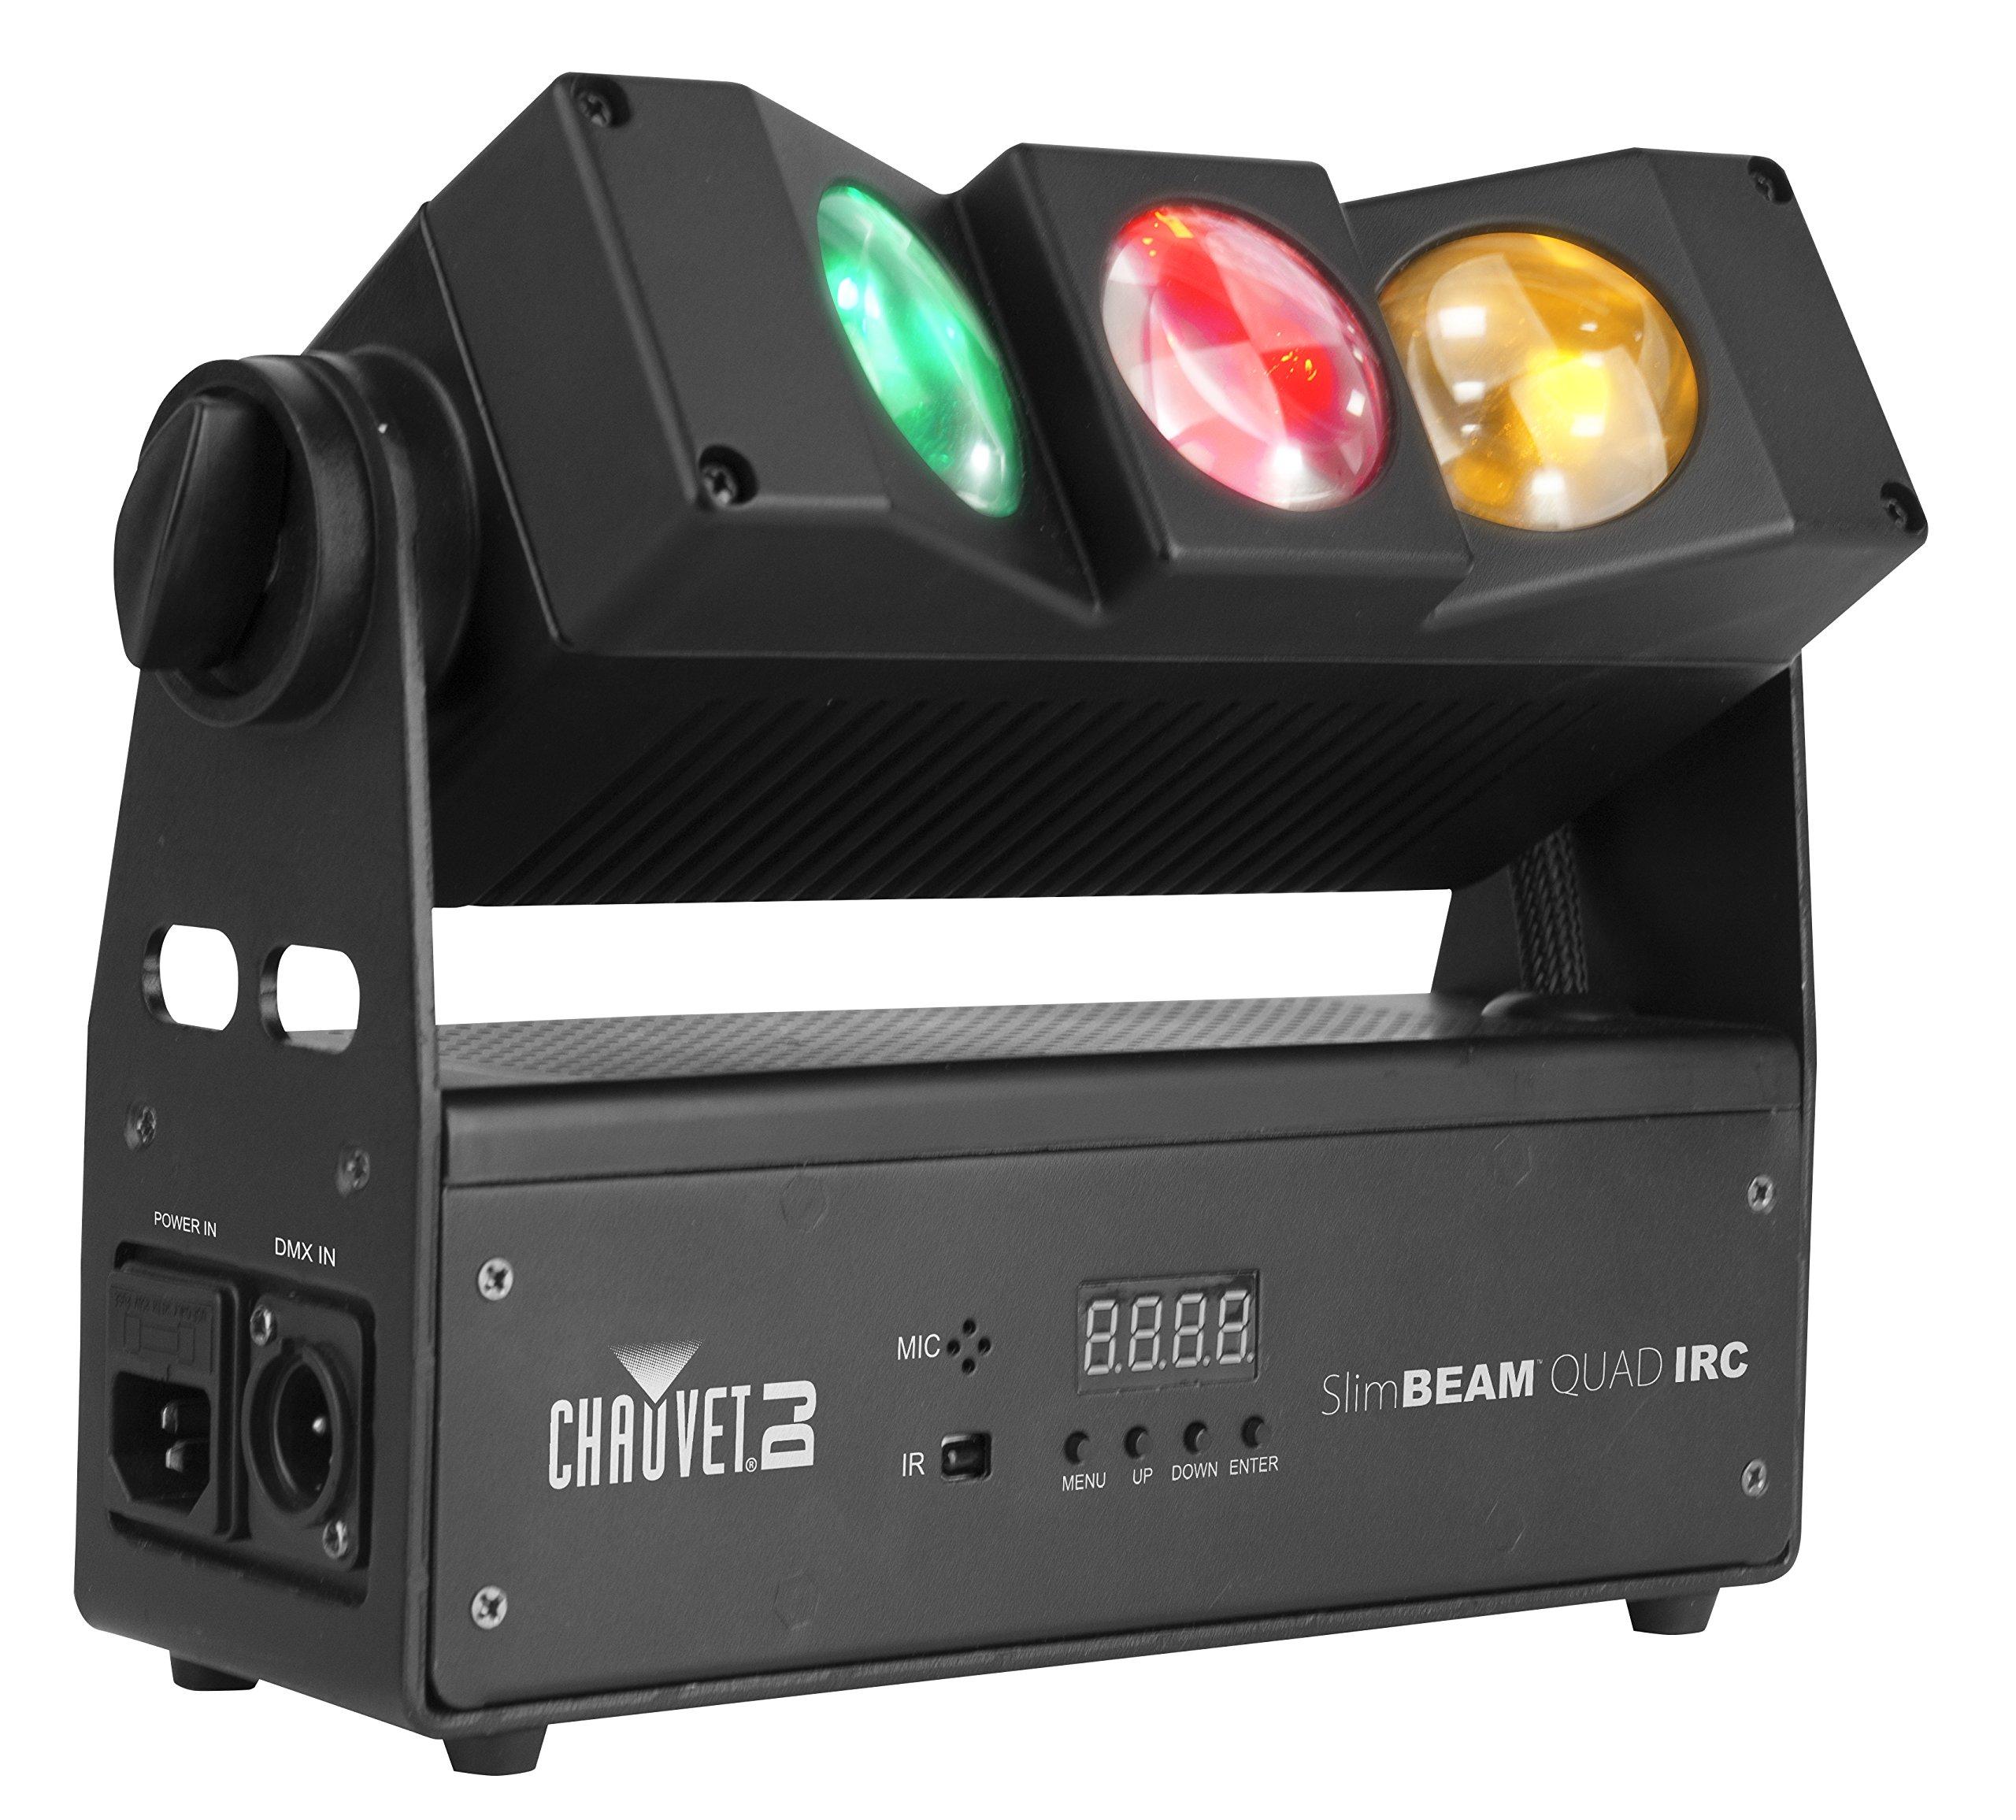 CHAUVET DJ SlimBEAM Quad IRC Effect/Wash DJ Light | LED Lighting